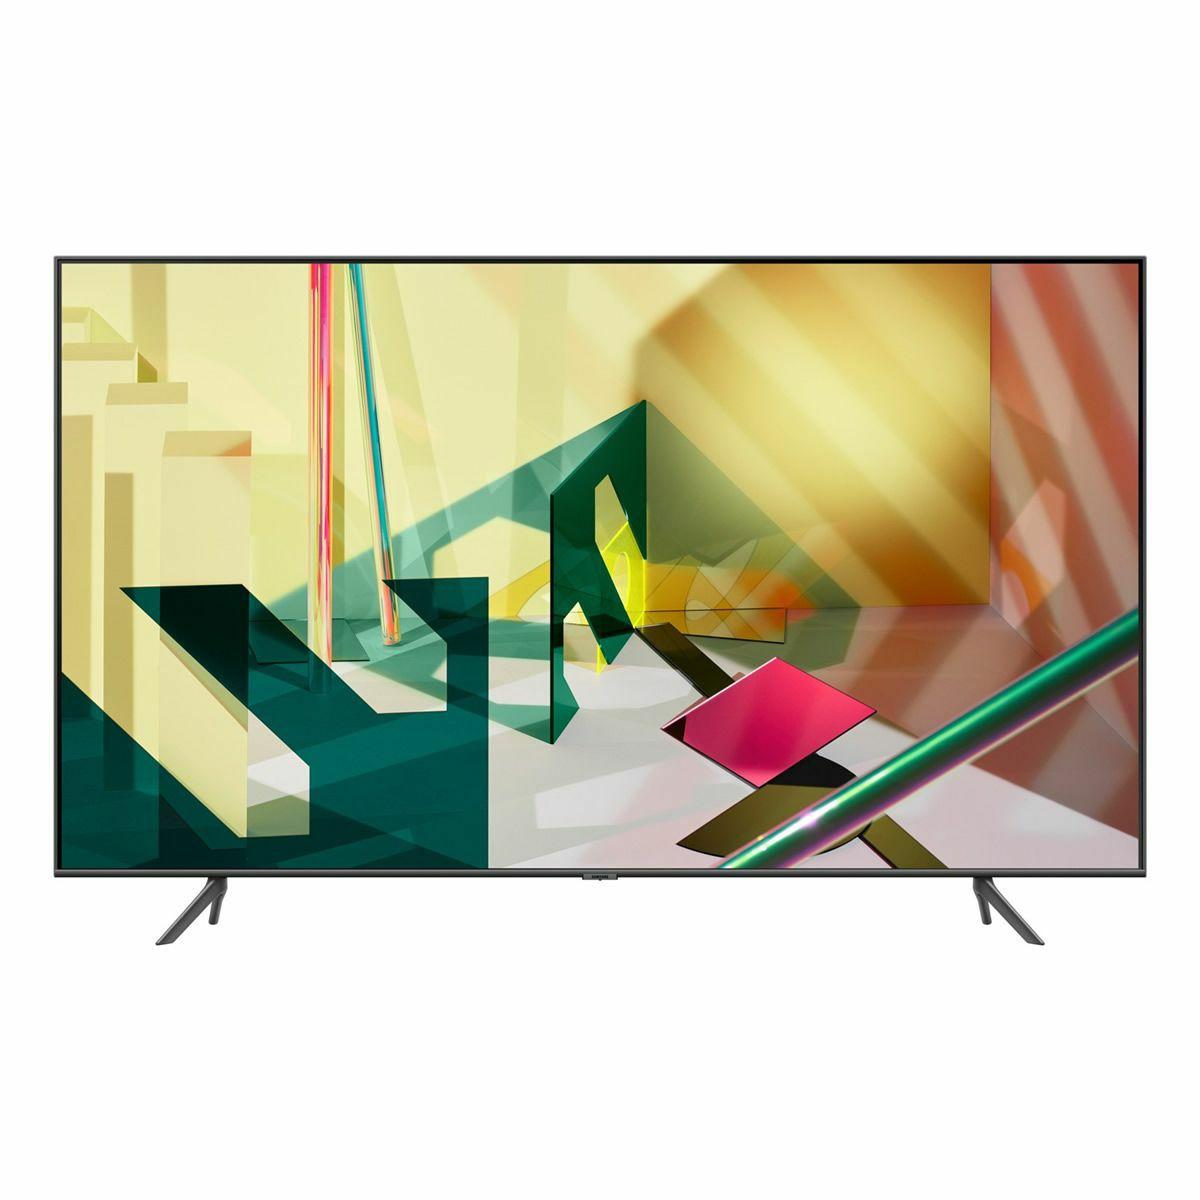 Samsung QE55Q70TATXX 55inch QLED UHD 4K Quantum HDR10+ TV £848 via Electrical Discount UK